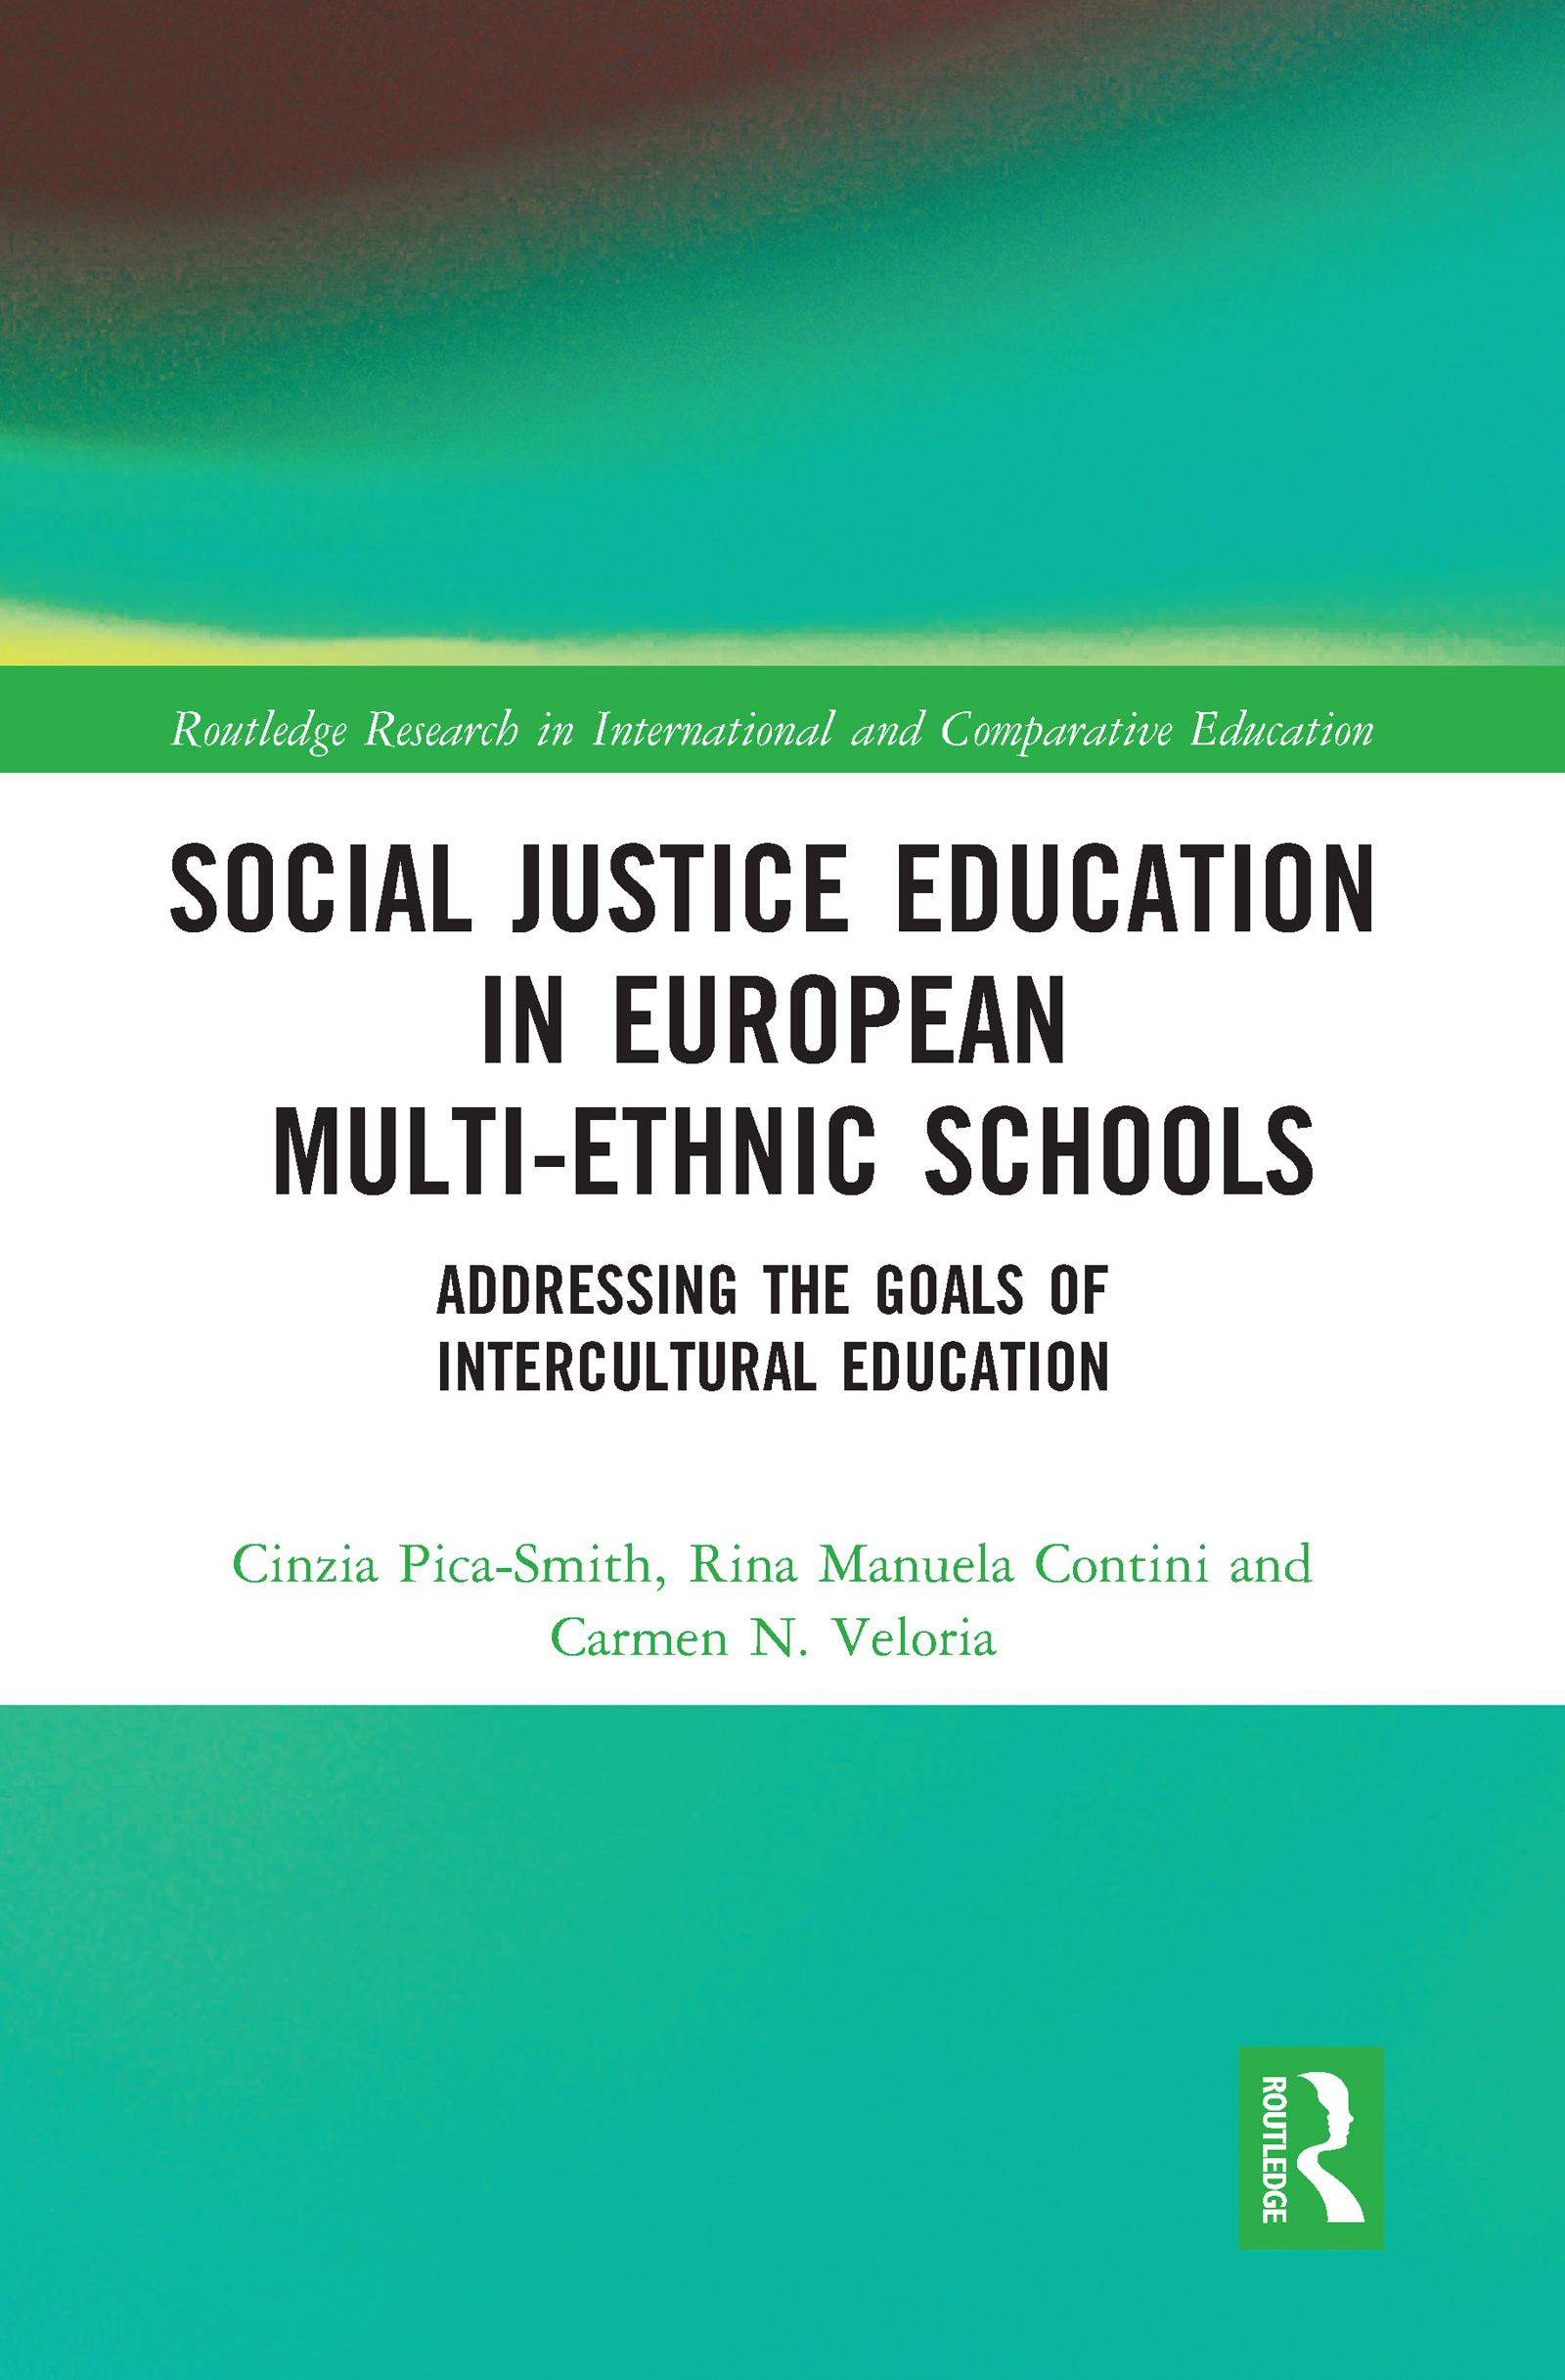 Social Justice Education in European Multi-ethnic Schools